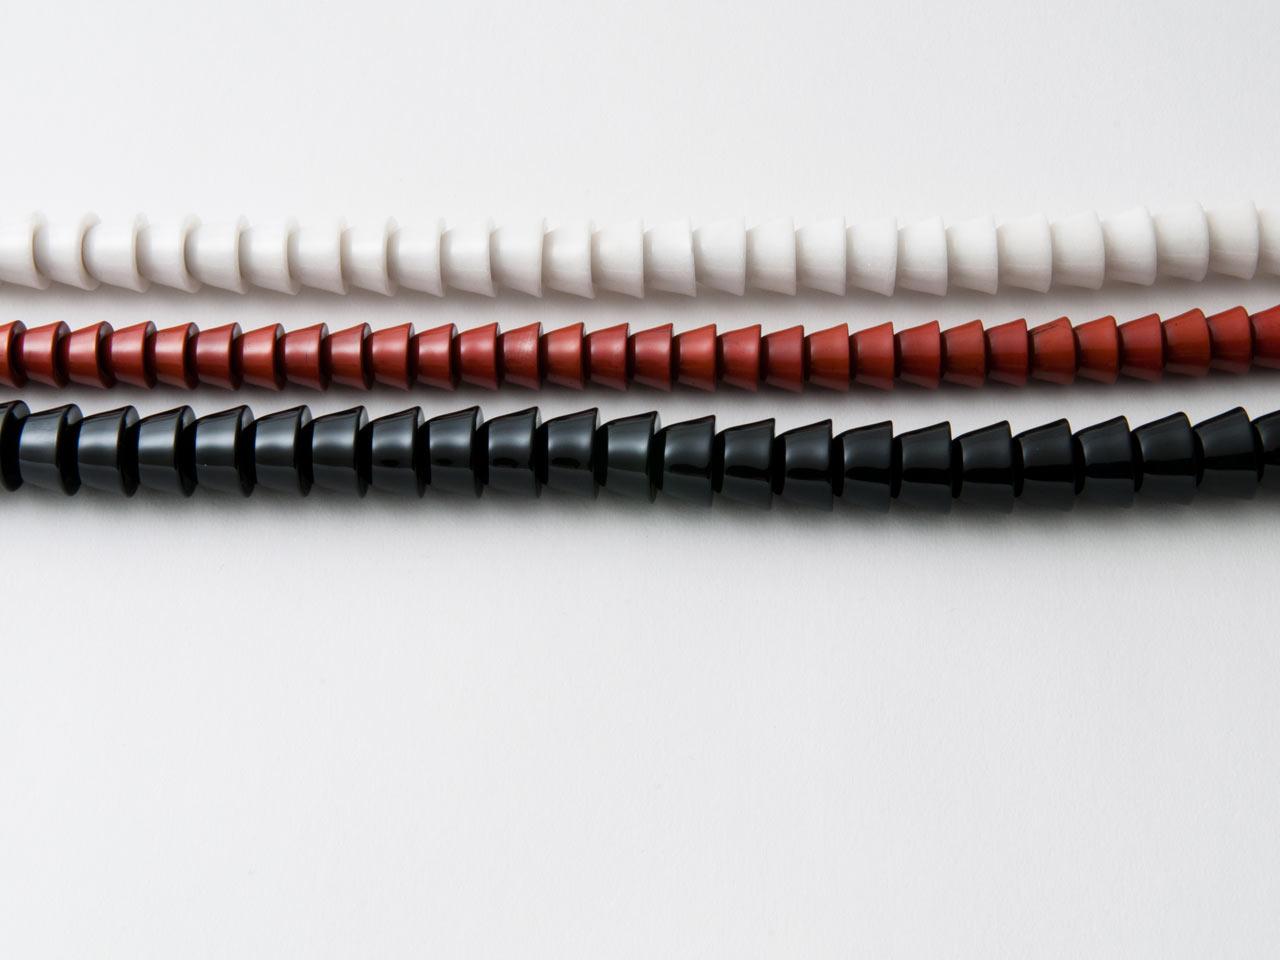 Perles-Necklace-Ronan-Erwan-Bouroullec-7